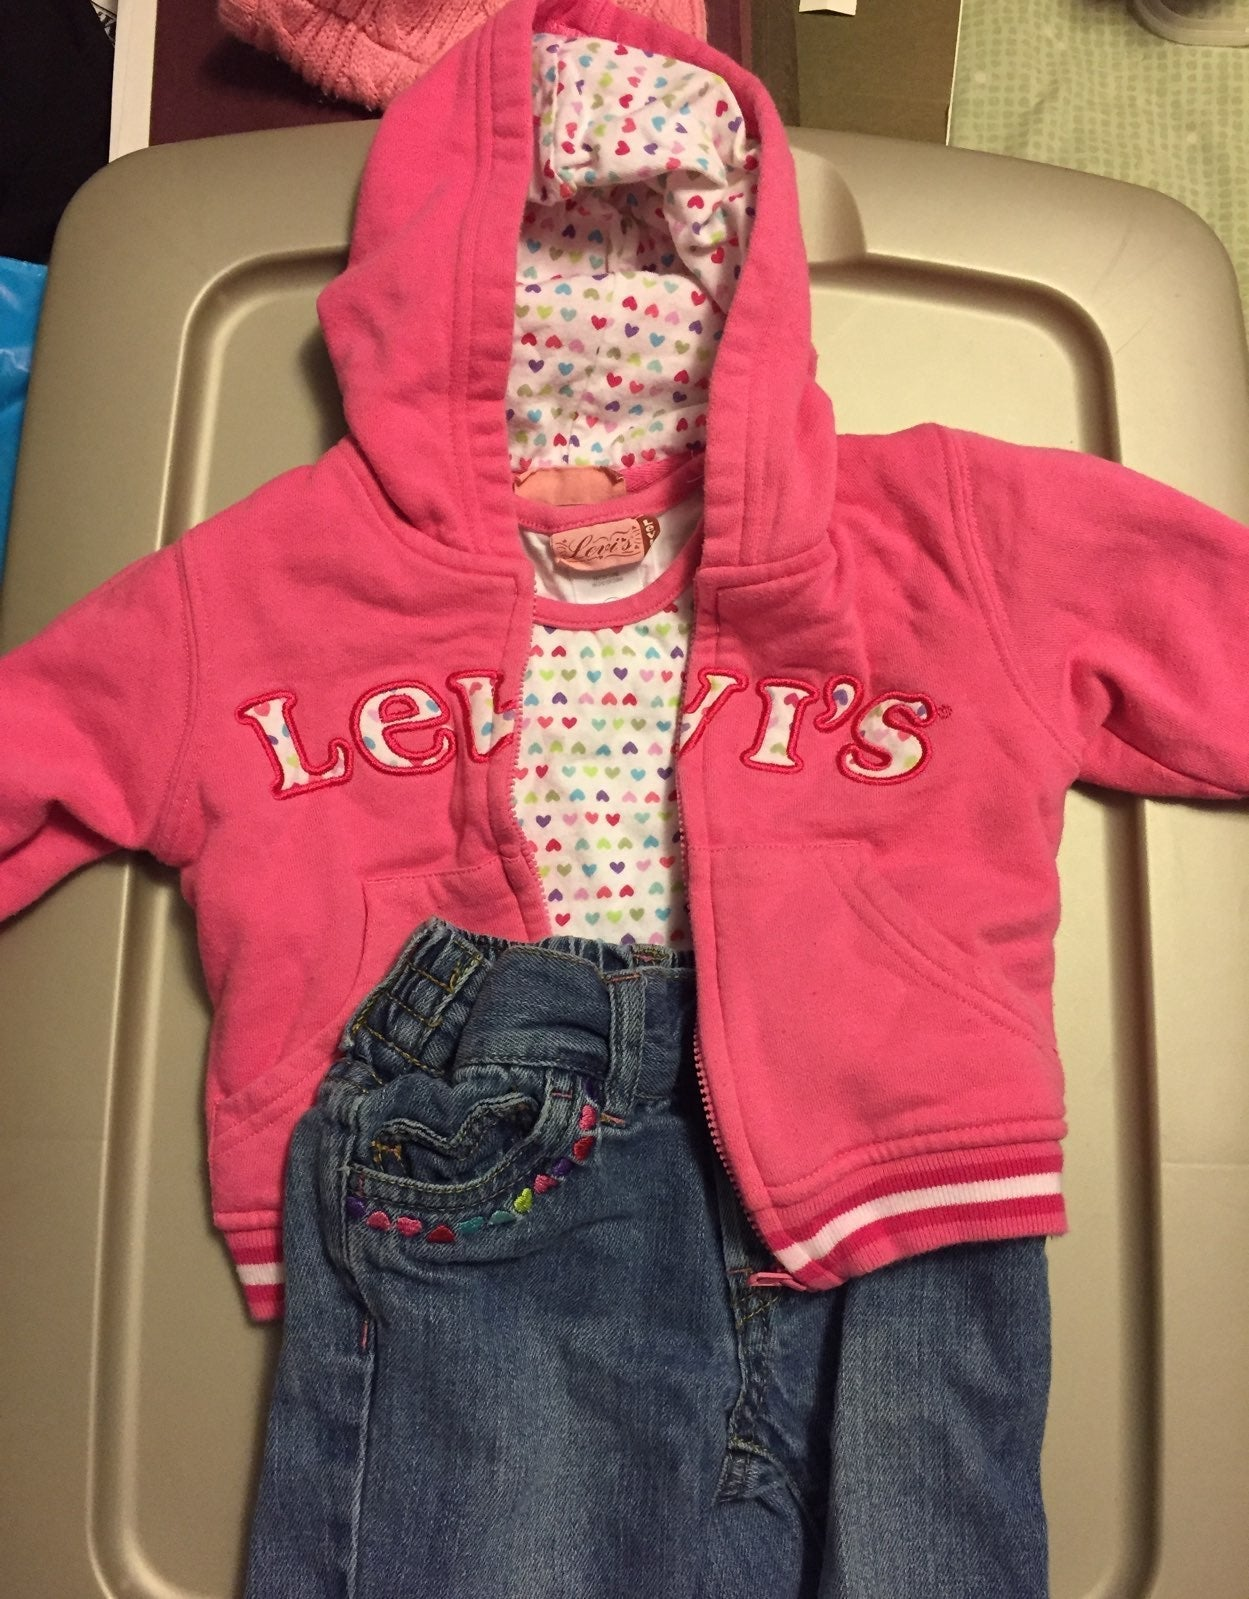 Levi's 3 piece outfit